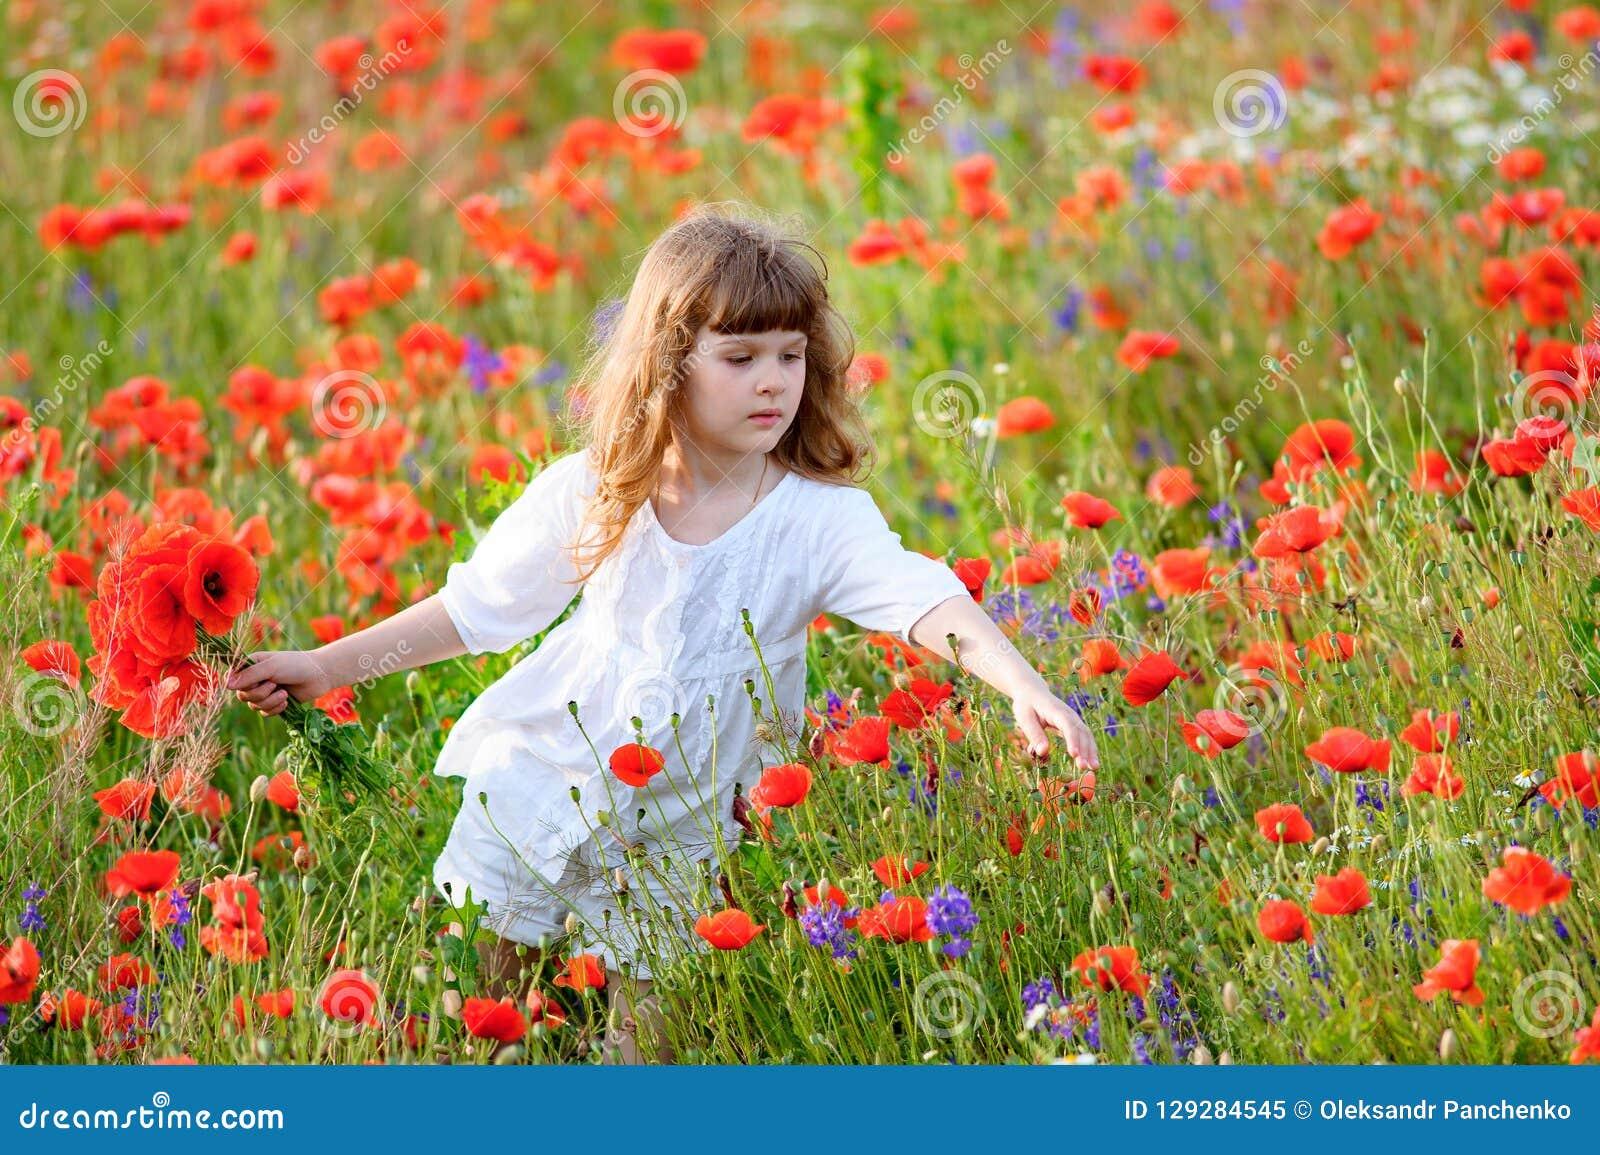 Adorable Little Girl In White Dress Playing In Poppy Flower